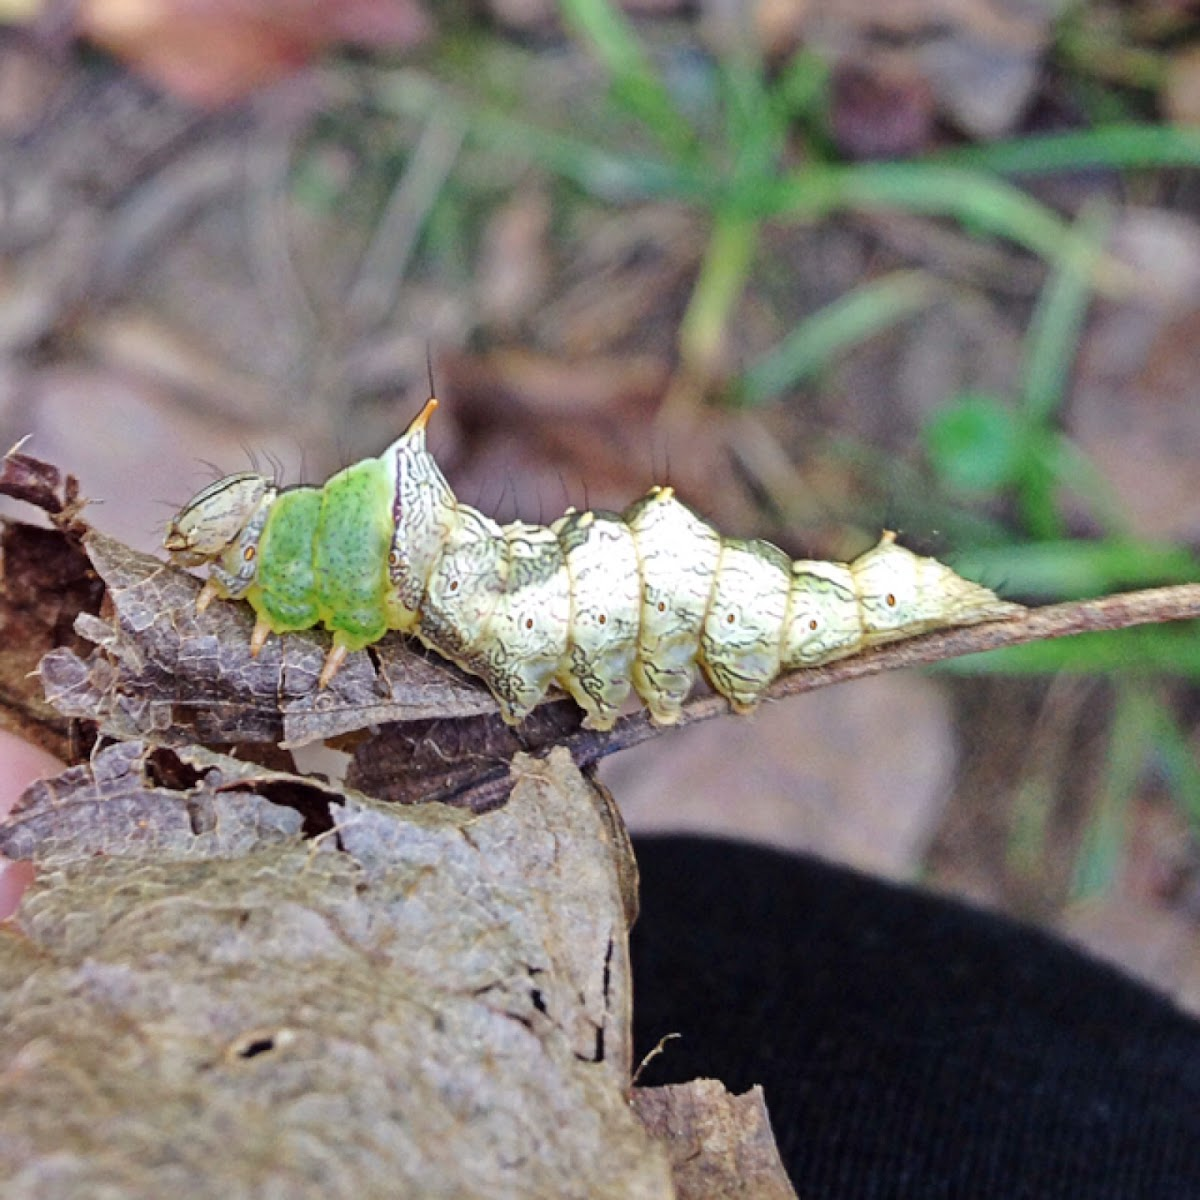 Morning-glory Prominent Moth Caterpillar